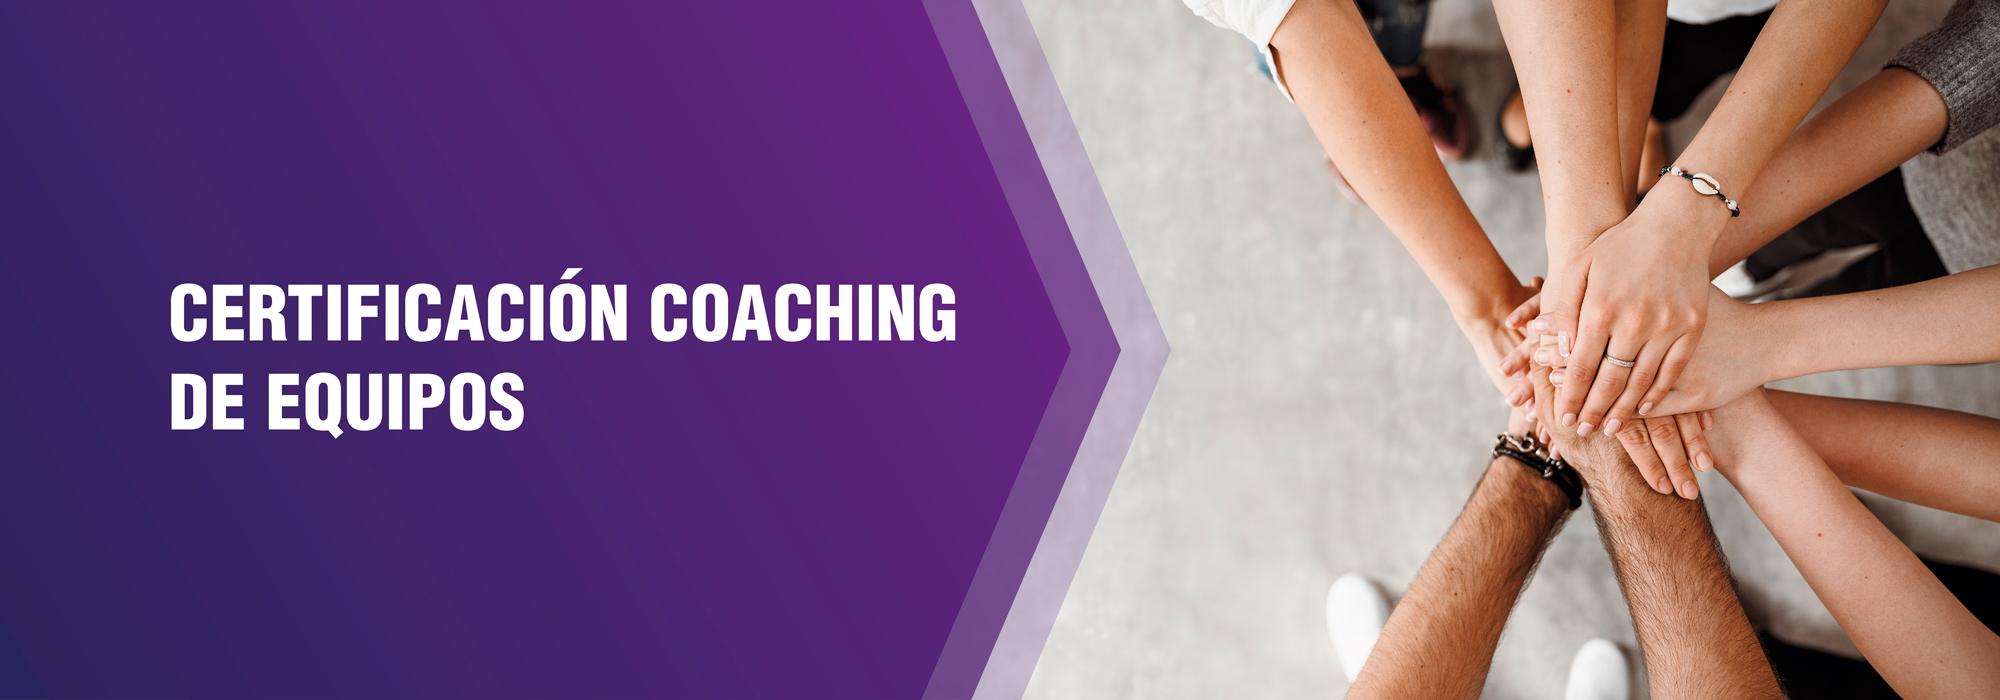 Certificación Top Intensive Training Coaching de Equipos